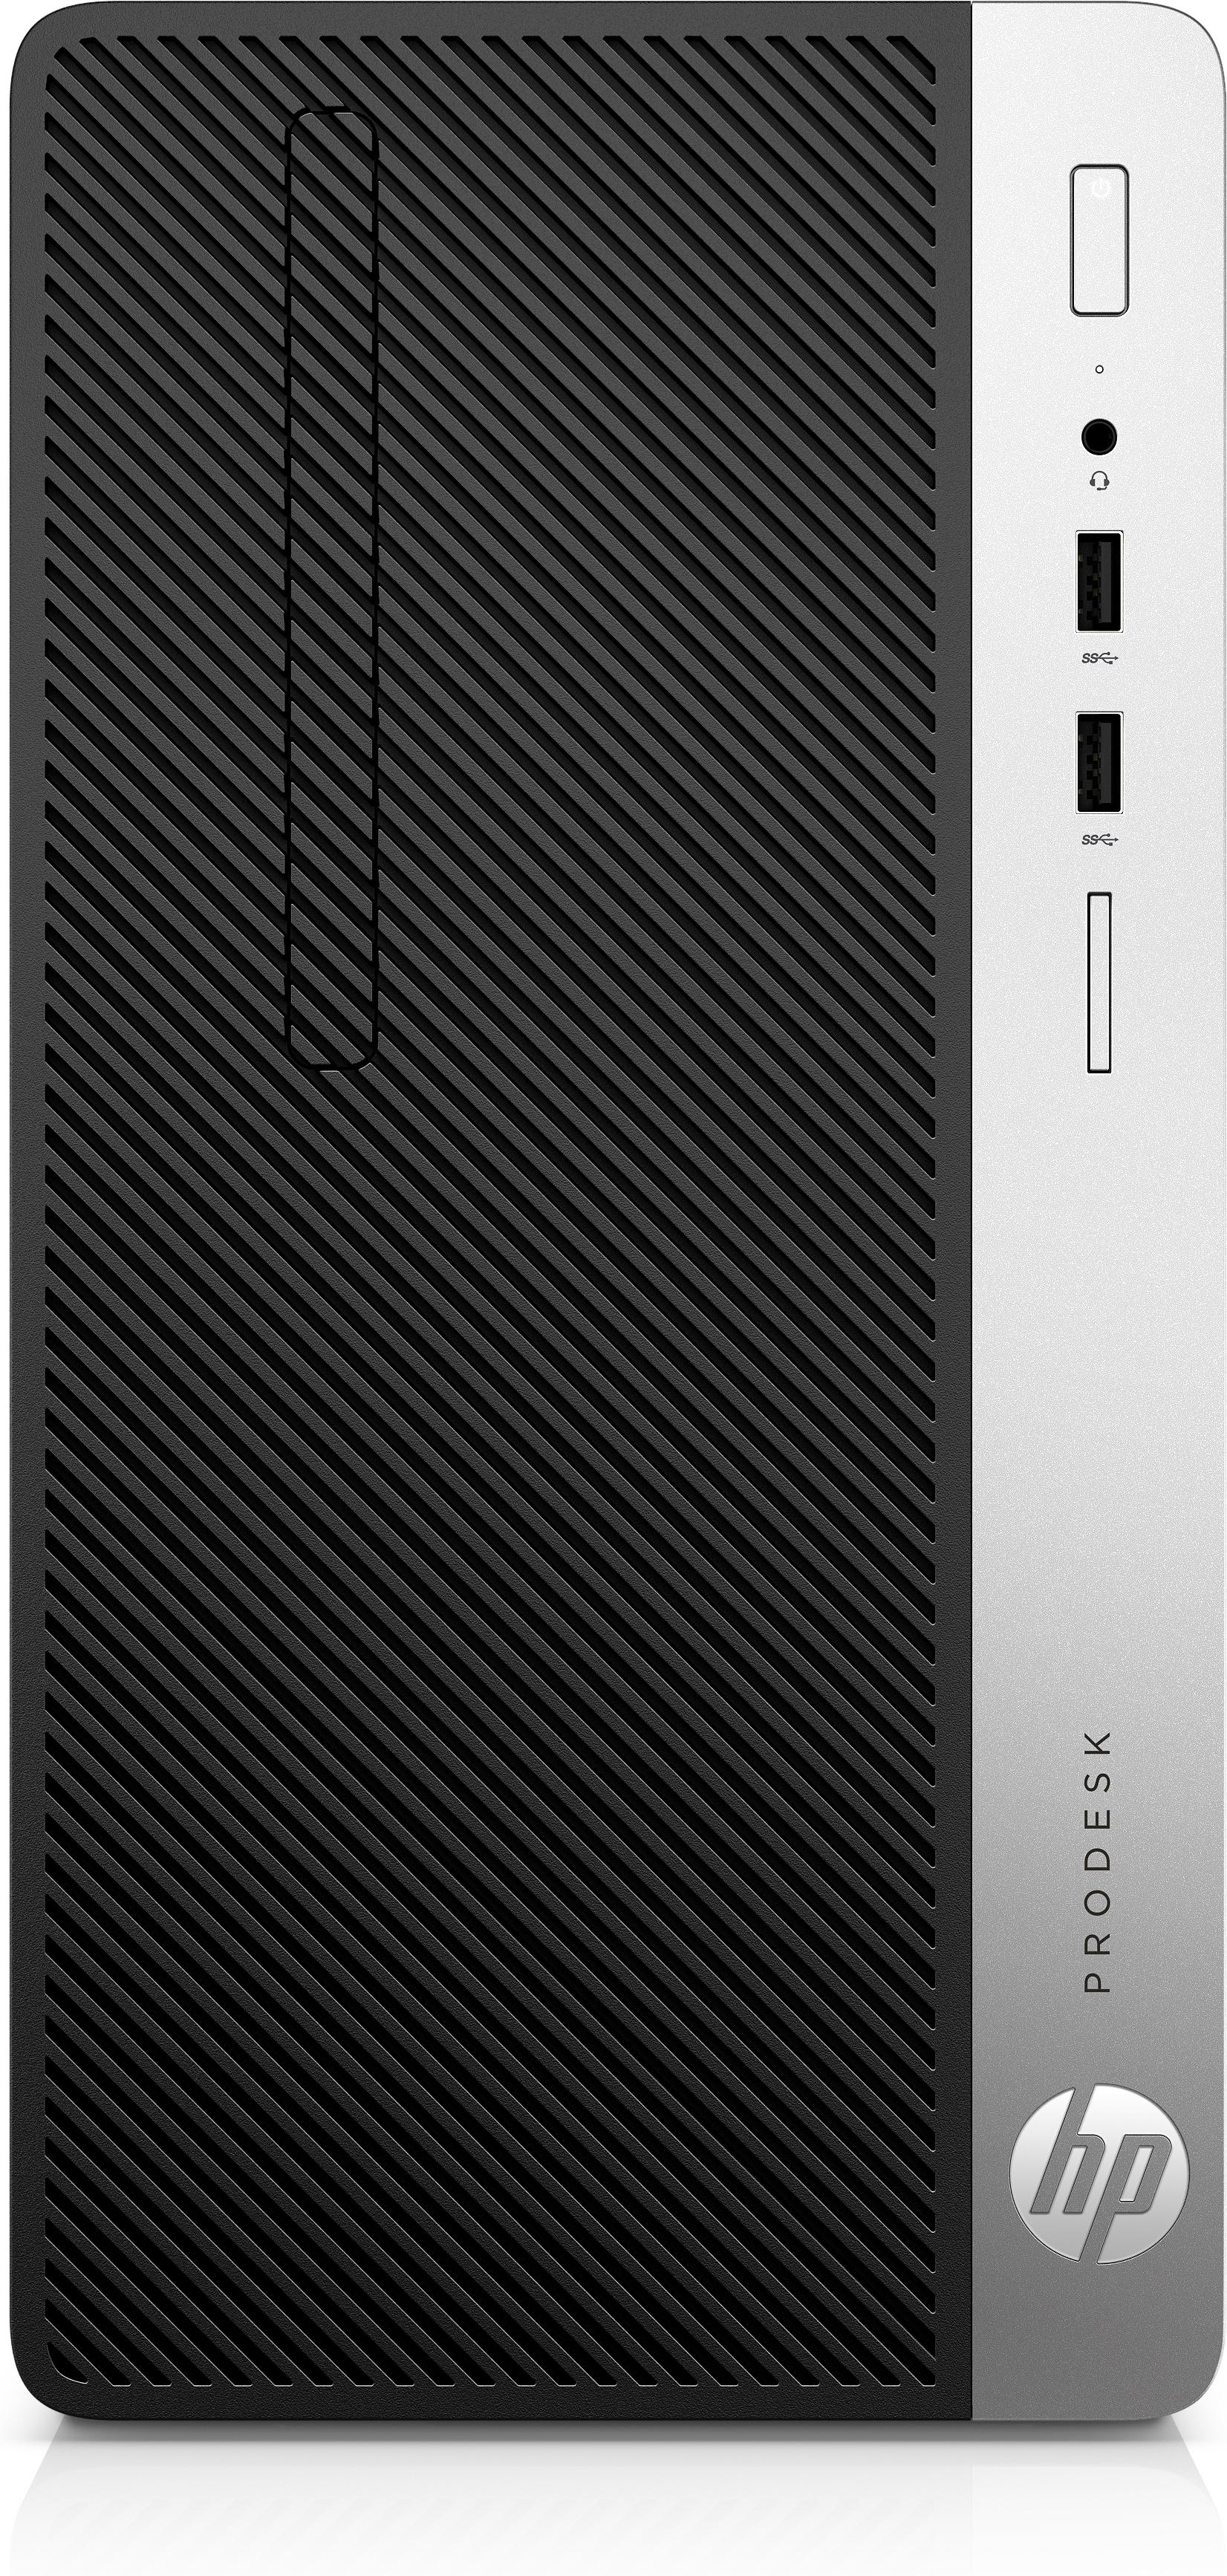 HP CORE I5-8500 8GB 256GB W10P